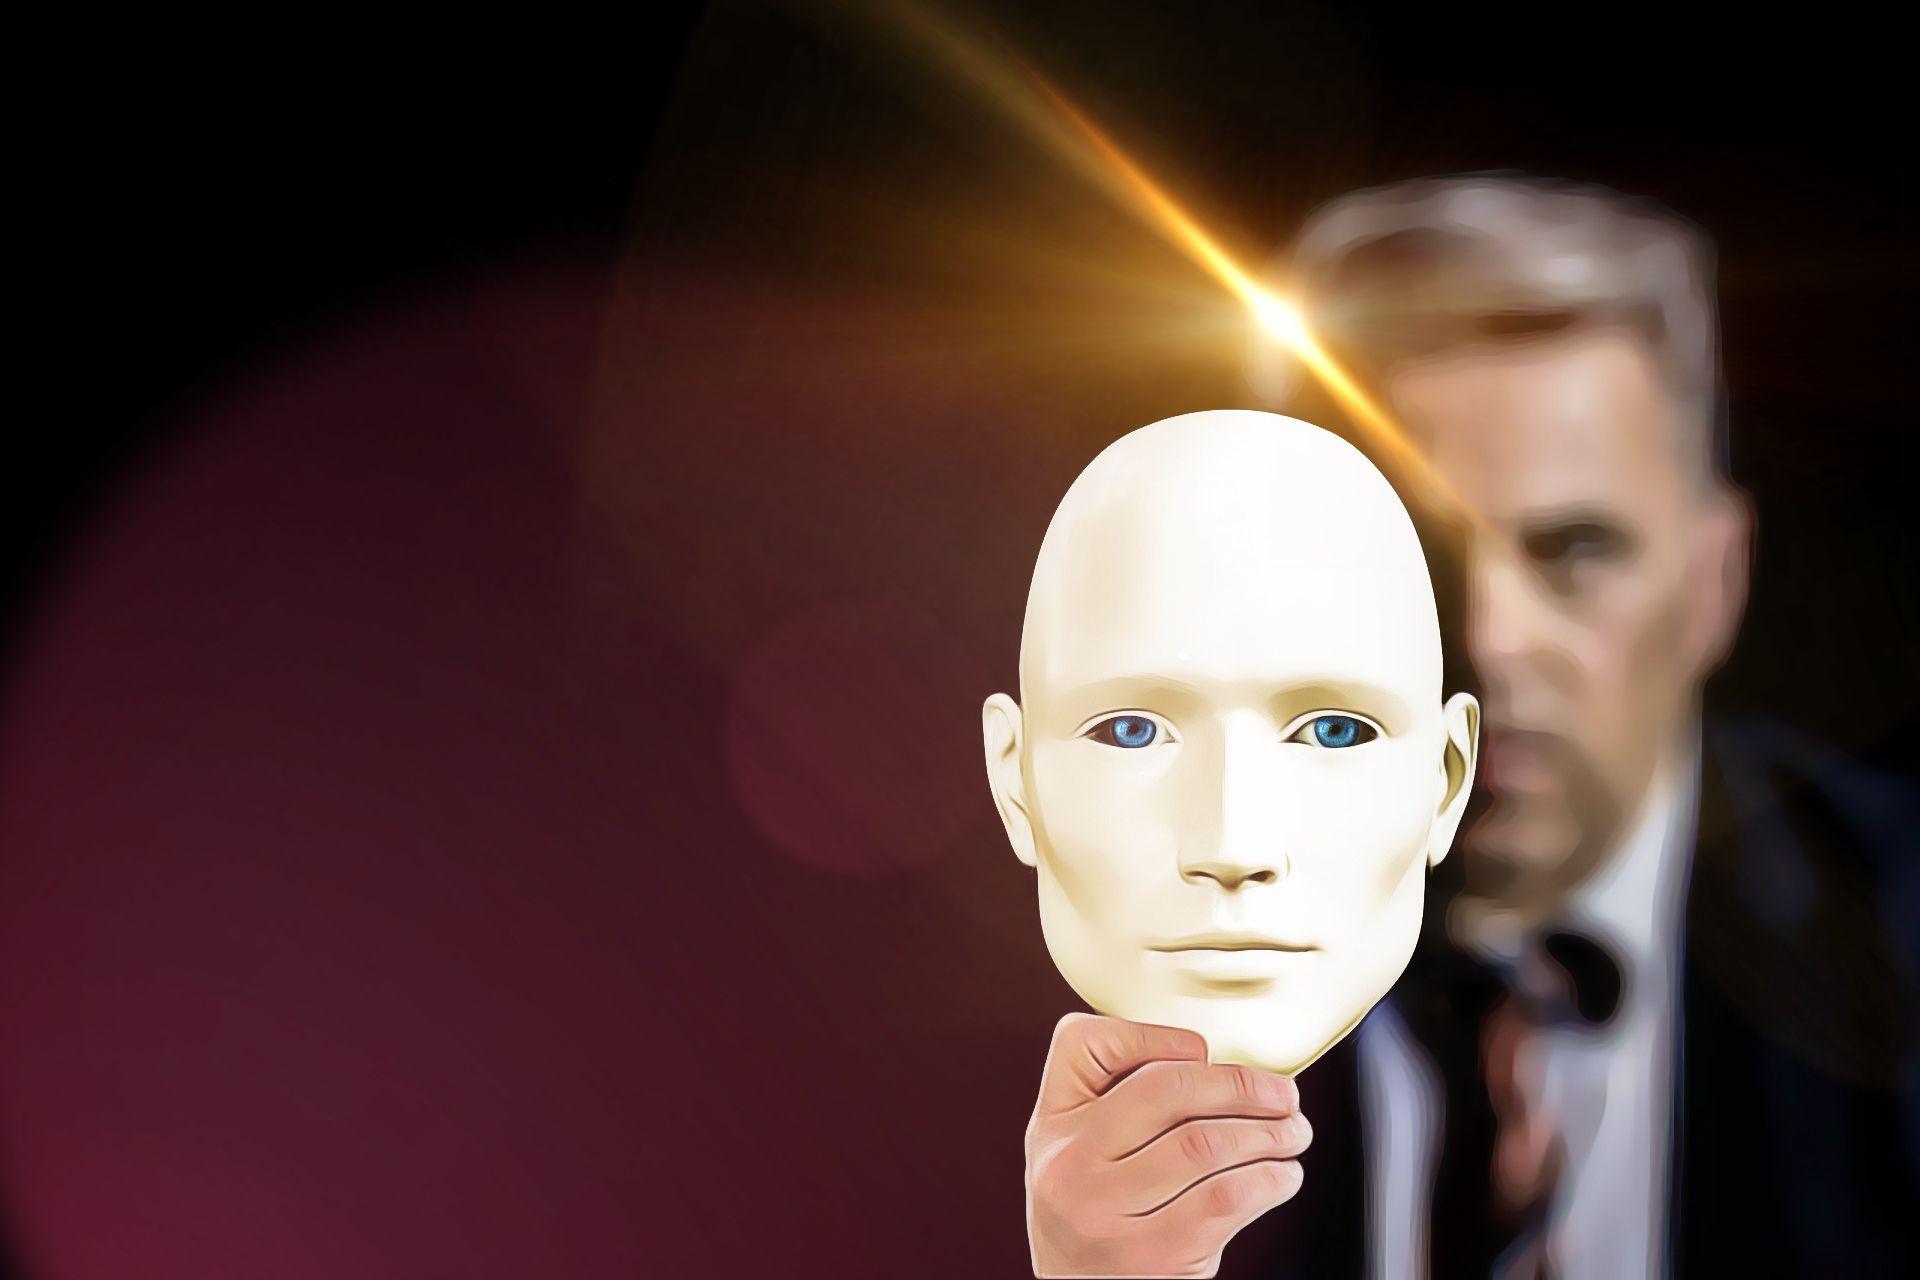 mascara-sindrome del impostor-dib